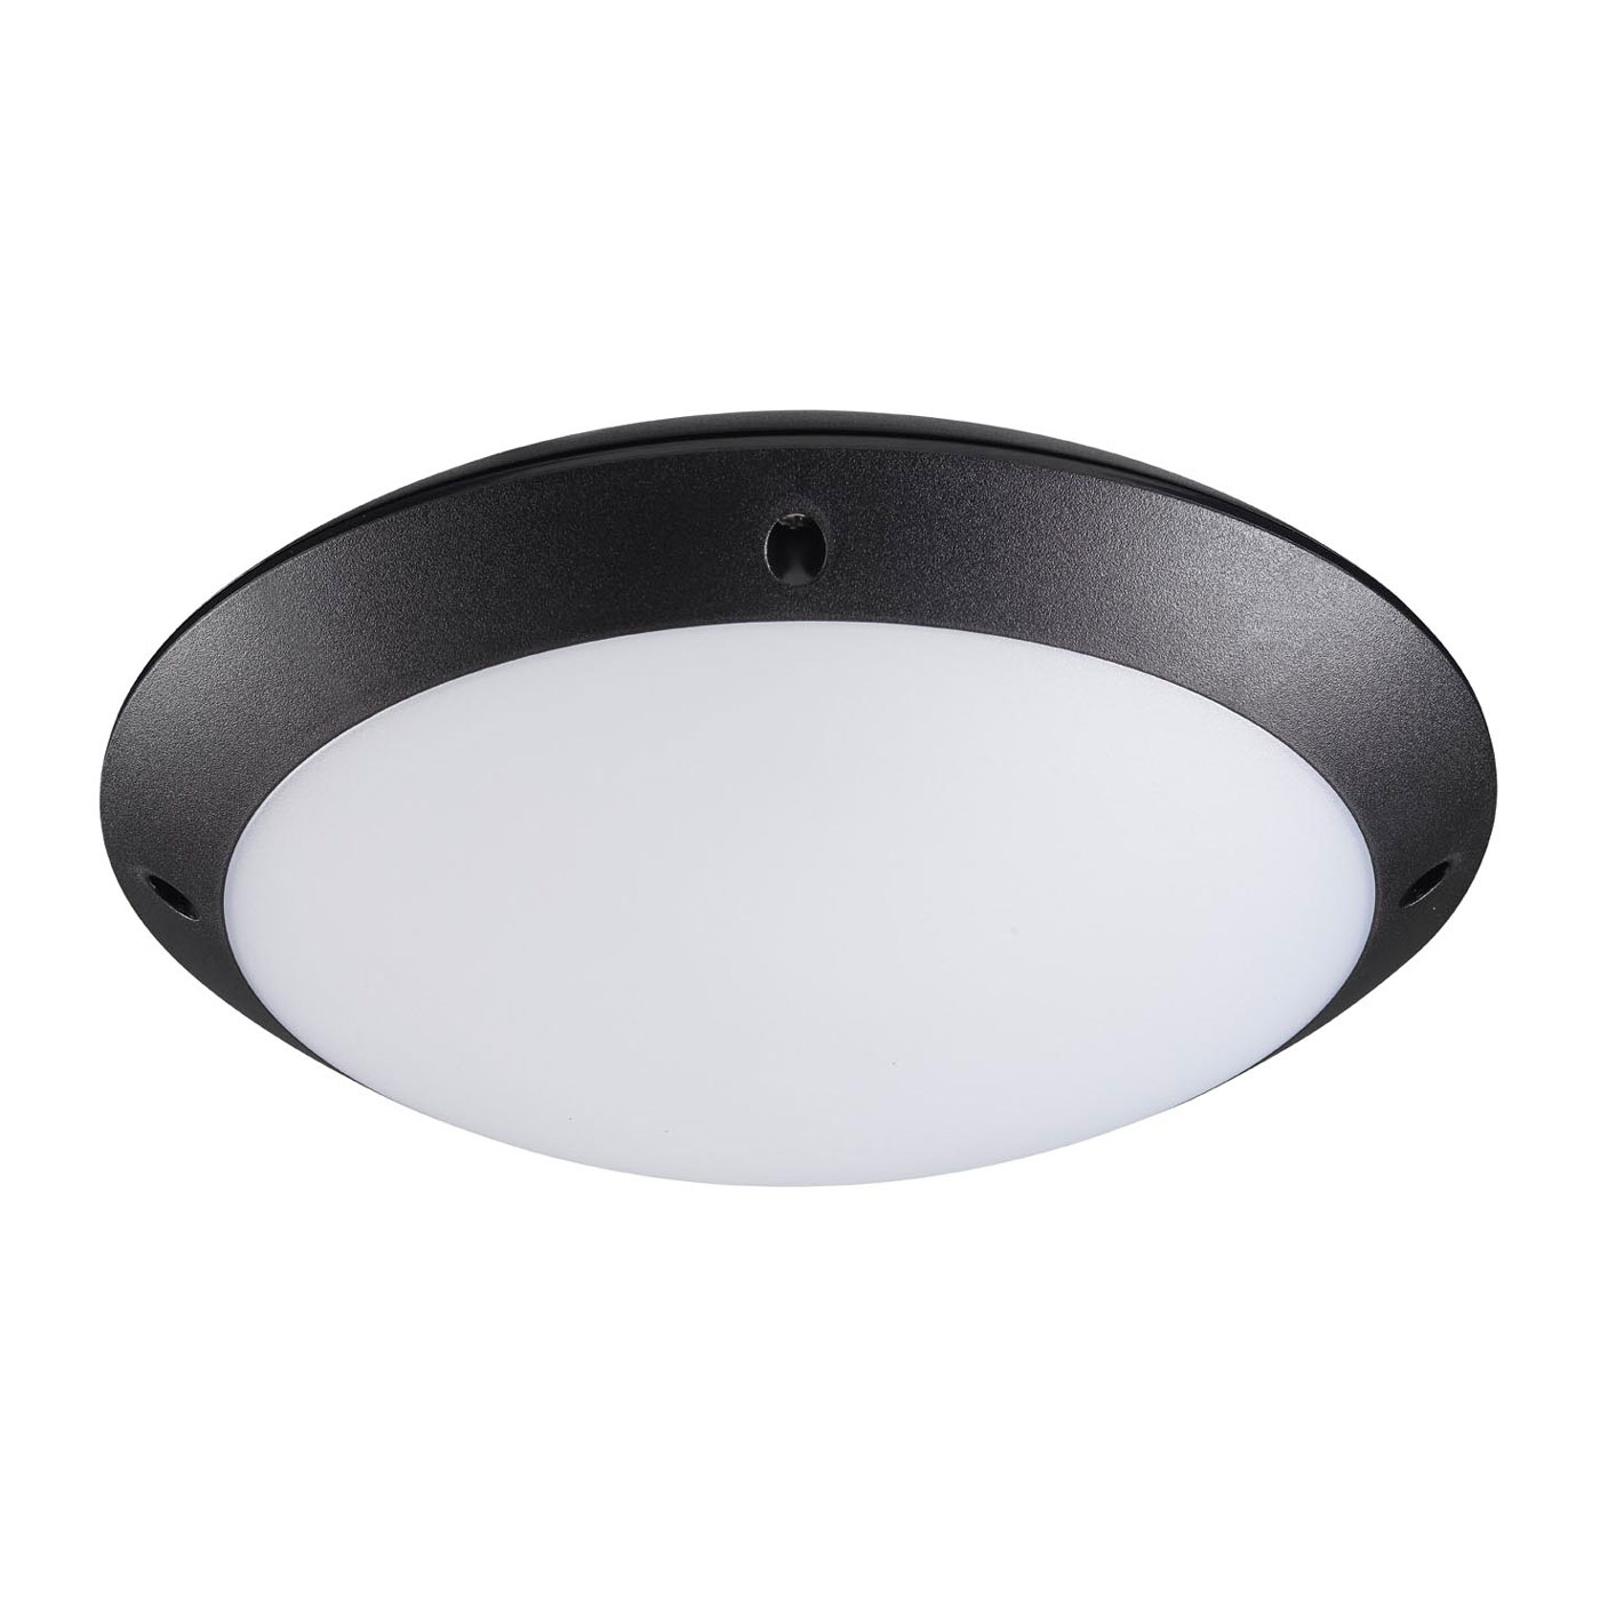 Sylvania Start Deckenlampe SensorDim 4000K schwarz